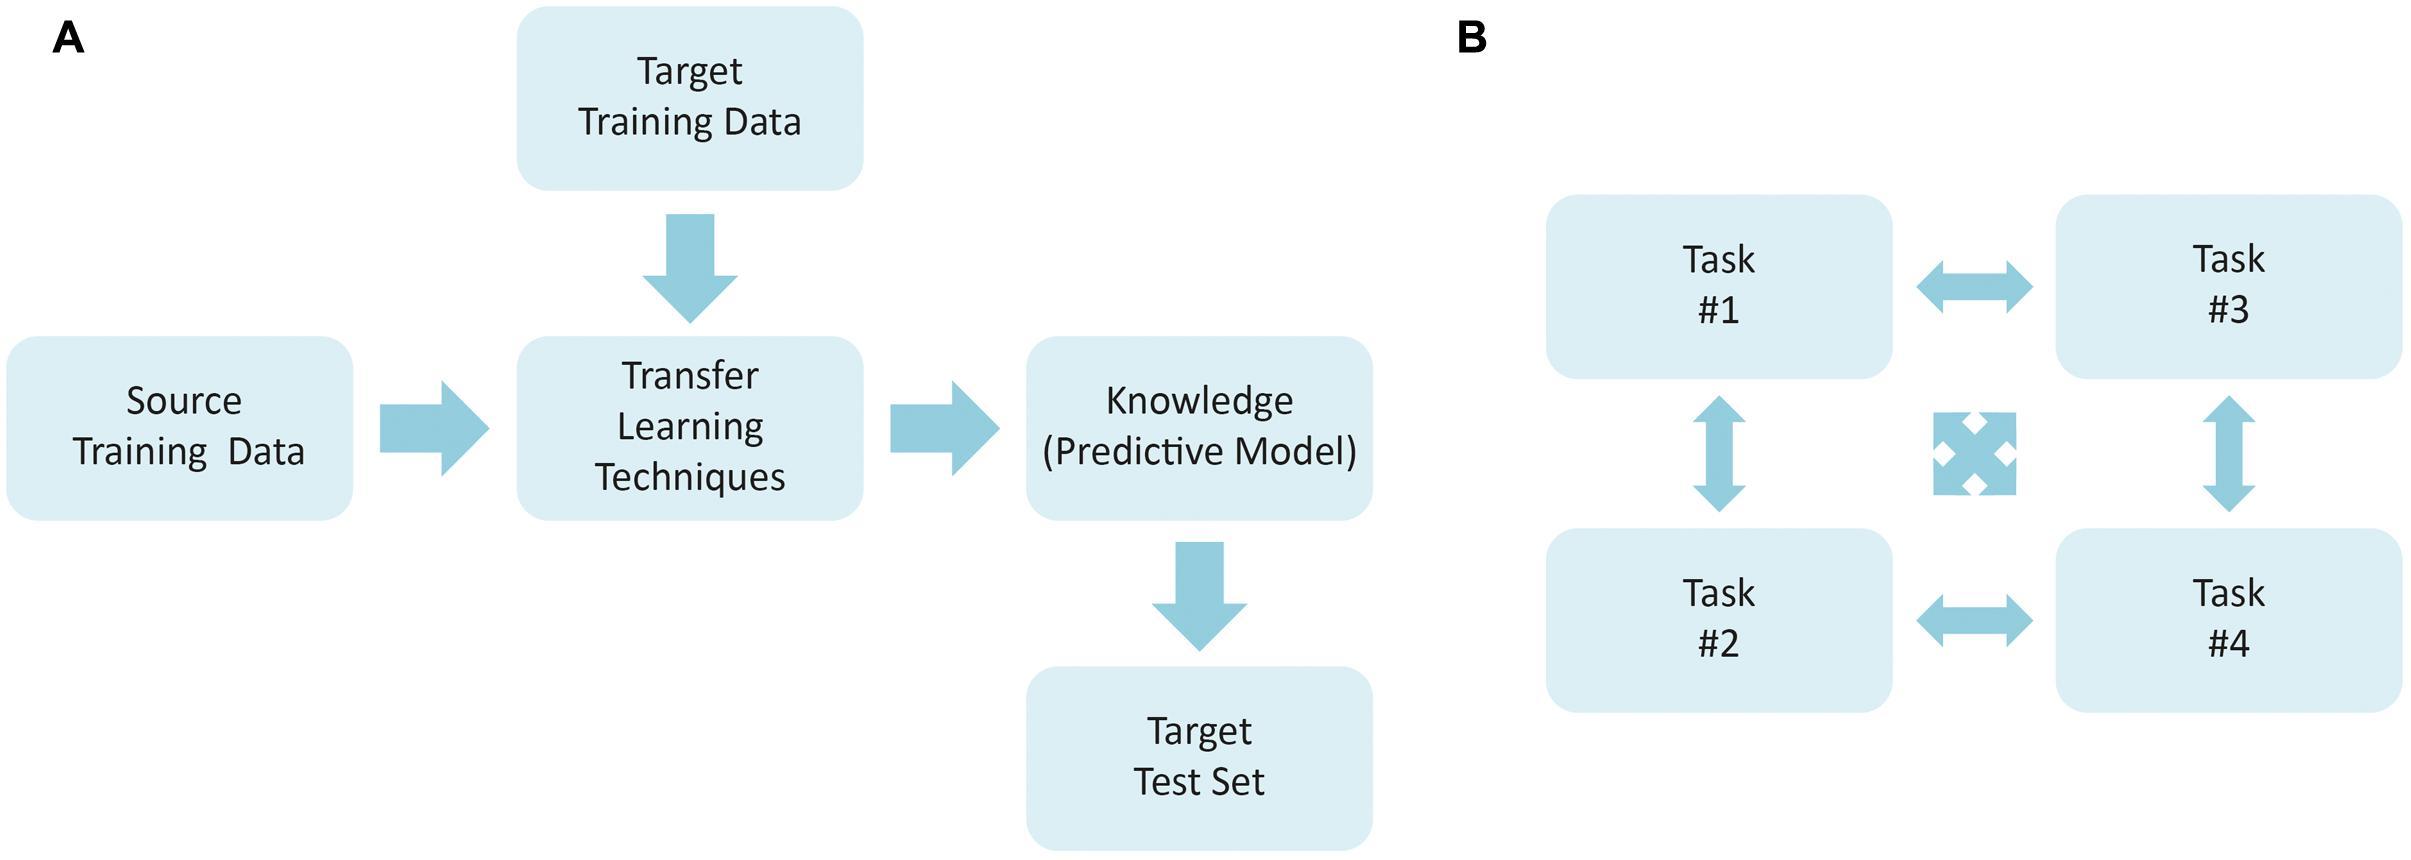 multi task learning tutorial